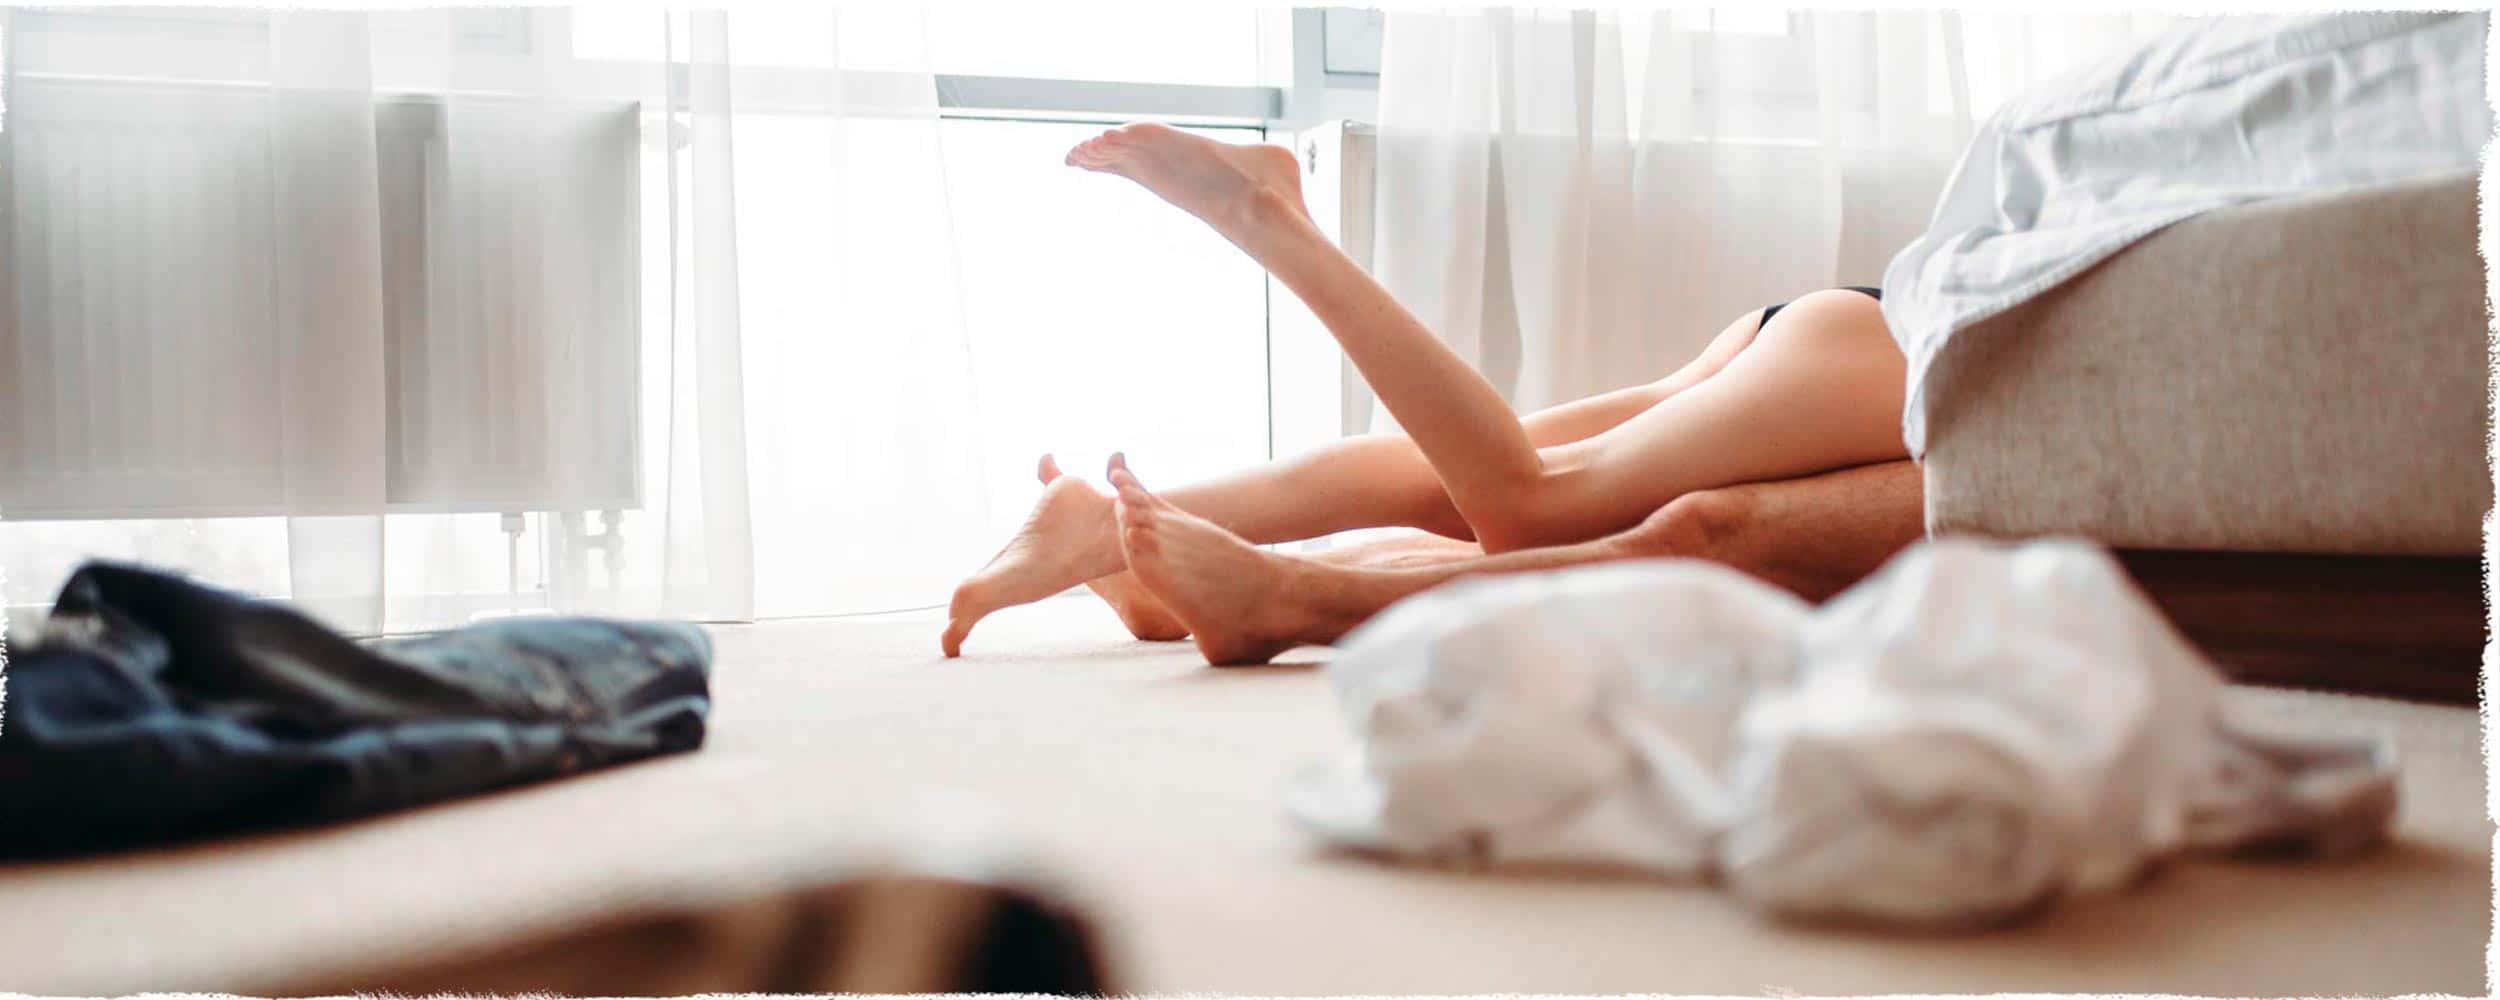 couples-legs@2x.jpg